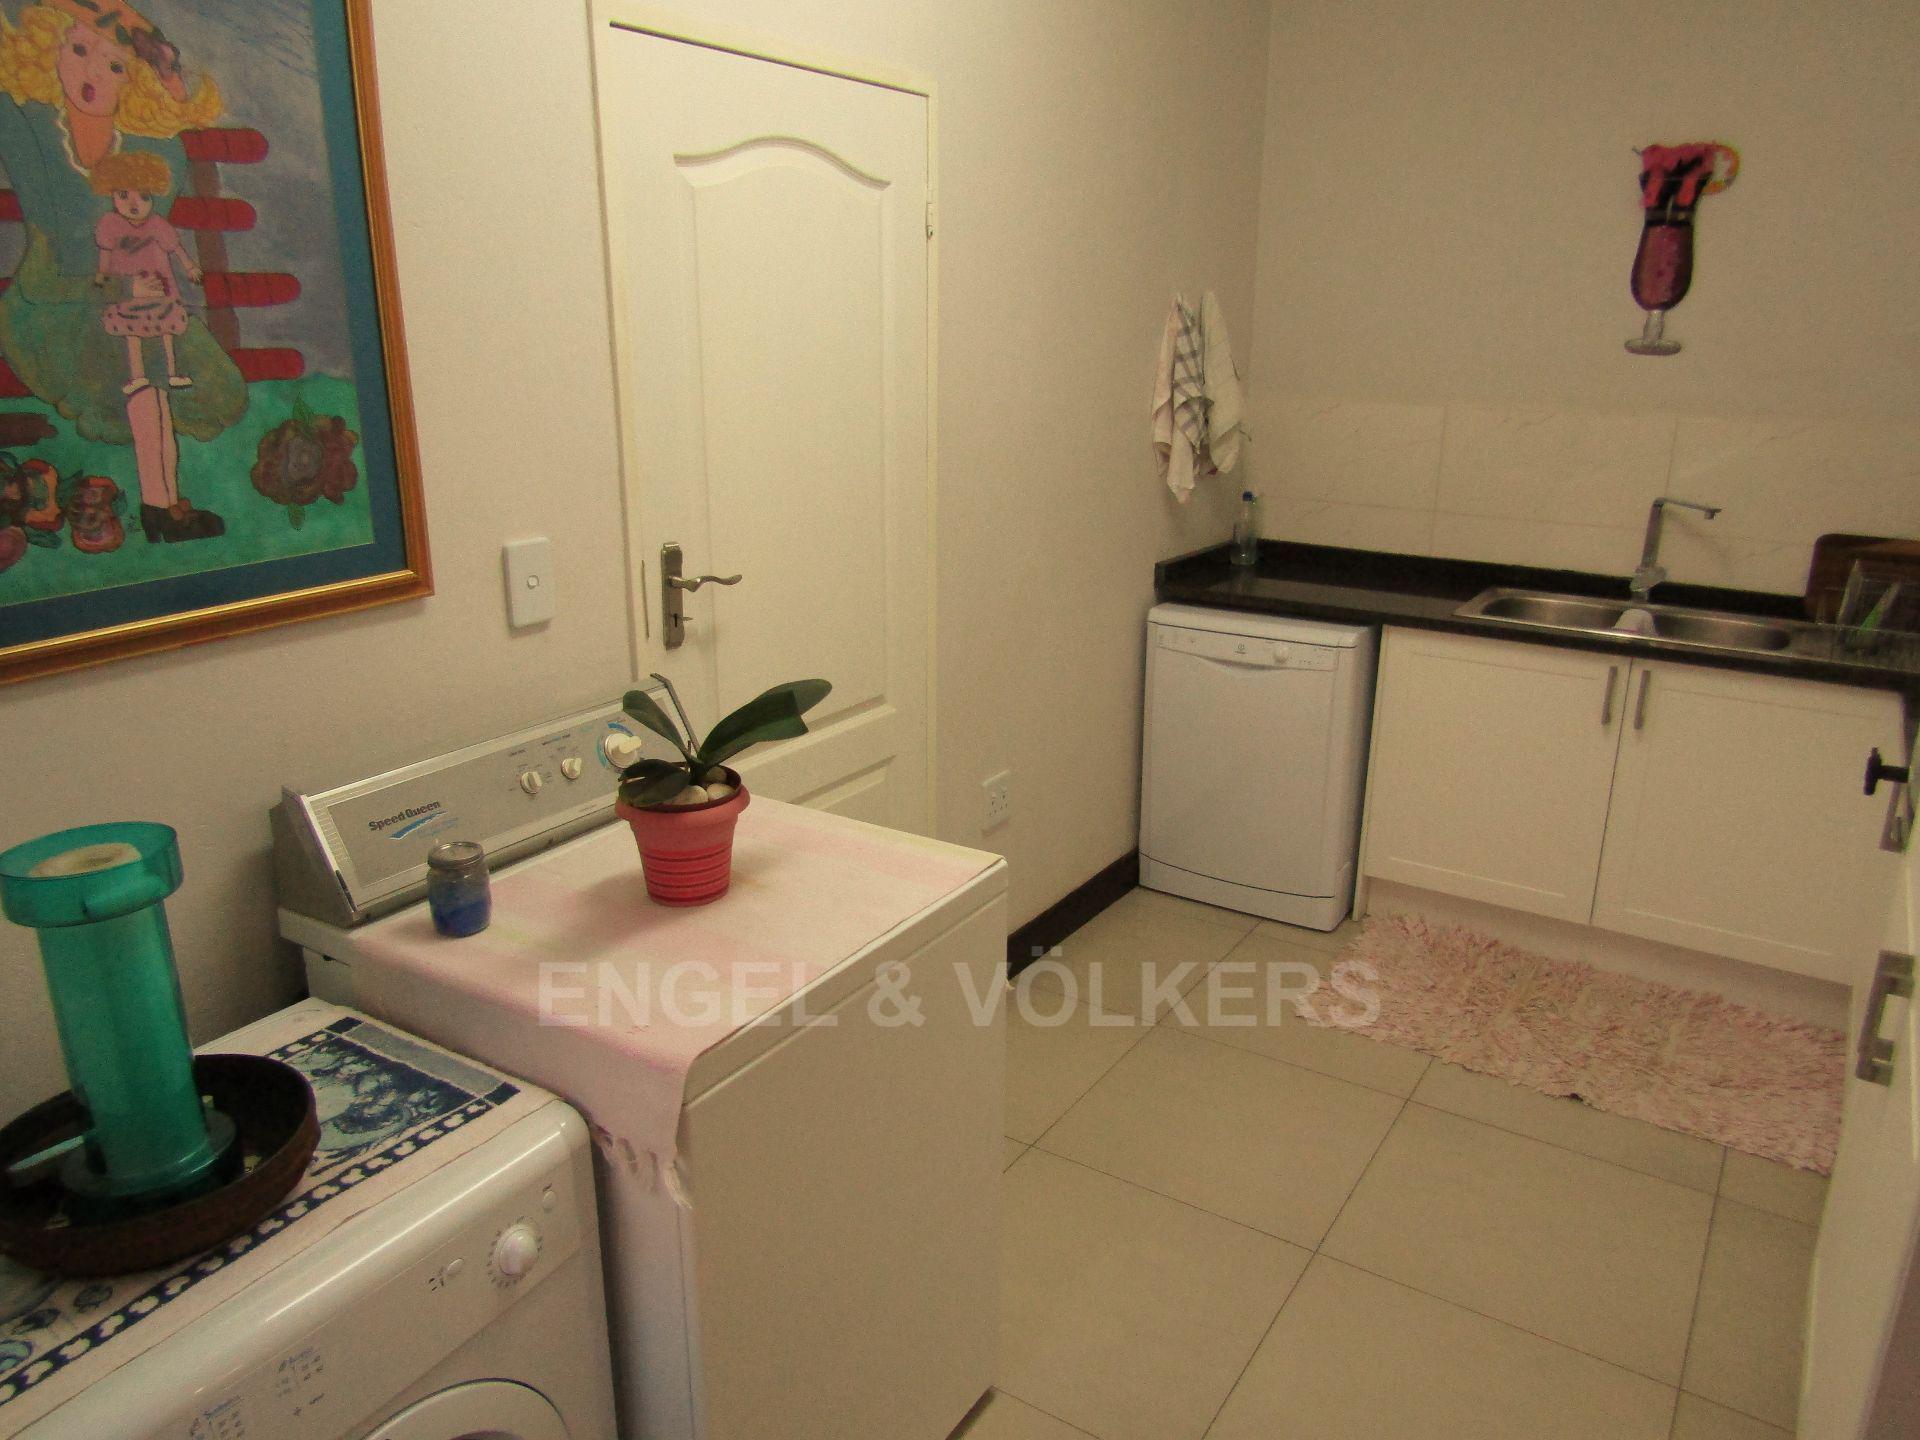 Lifestyle Estate property for sale. Ref No: 13458759. Picture no 8